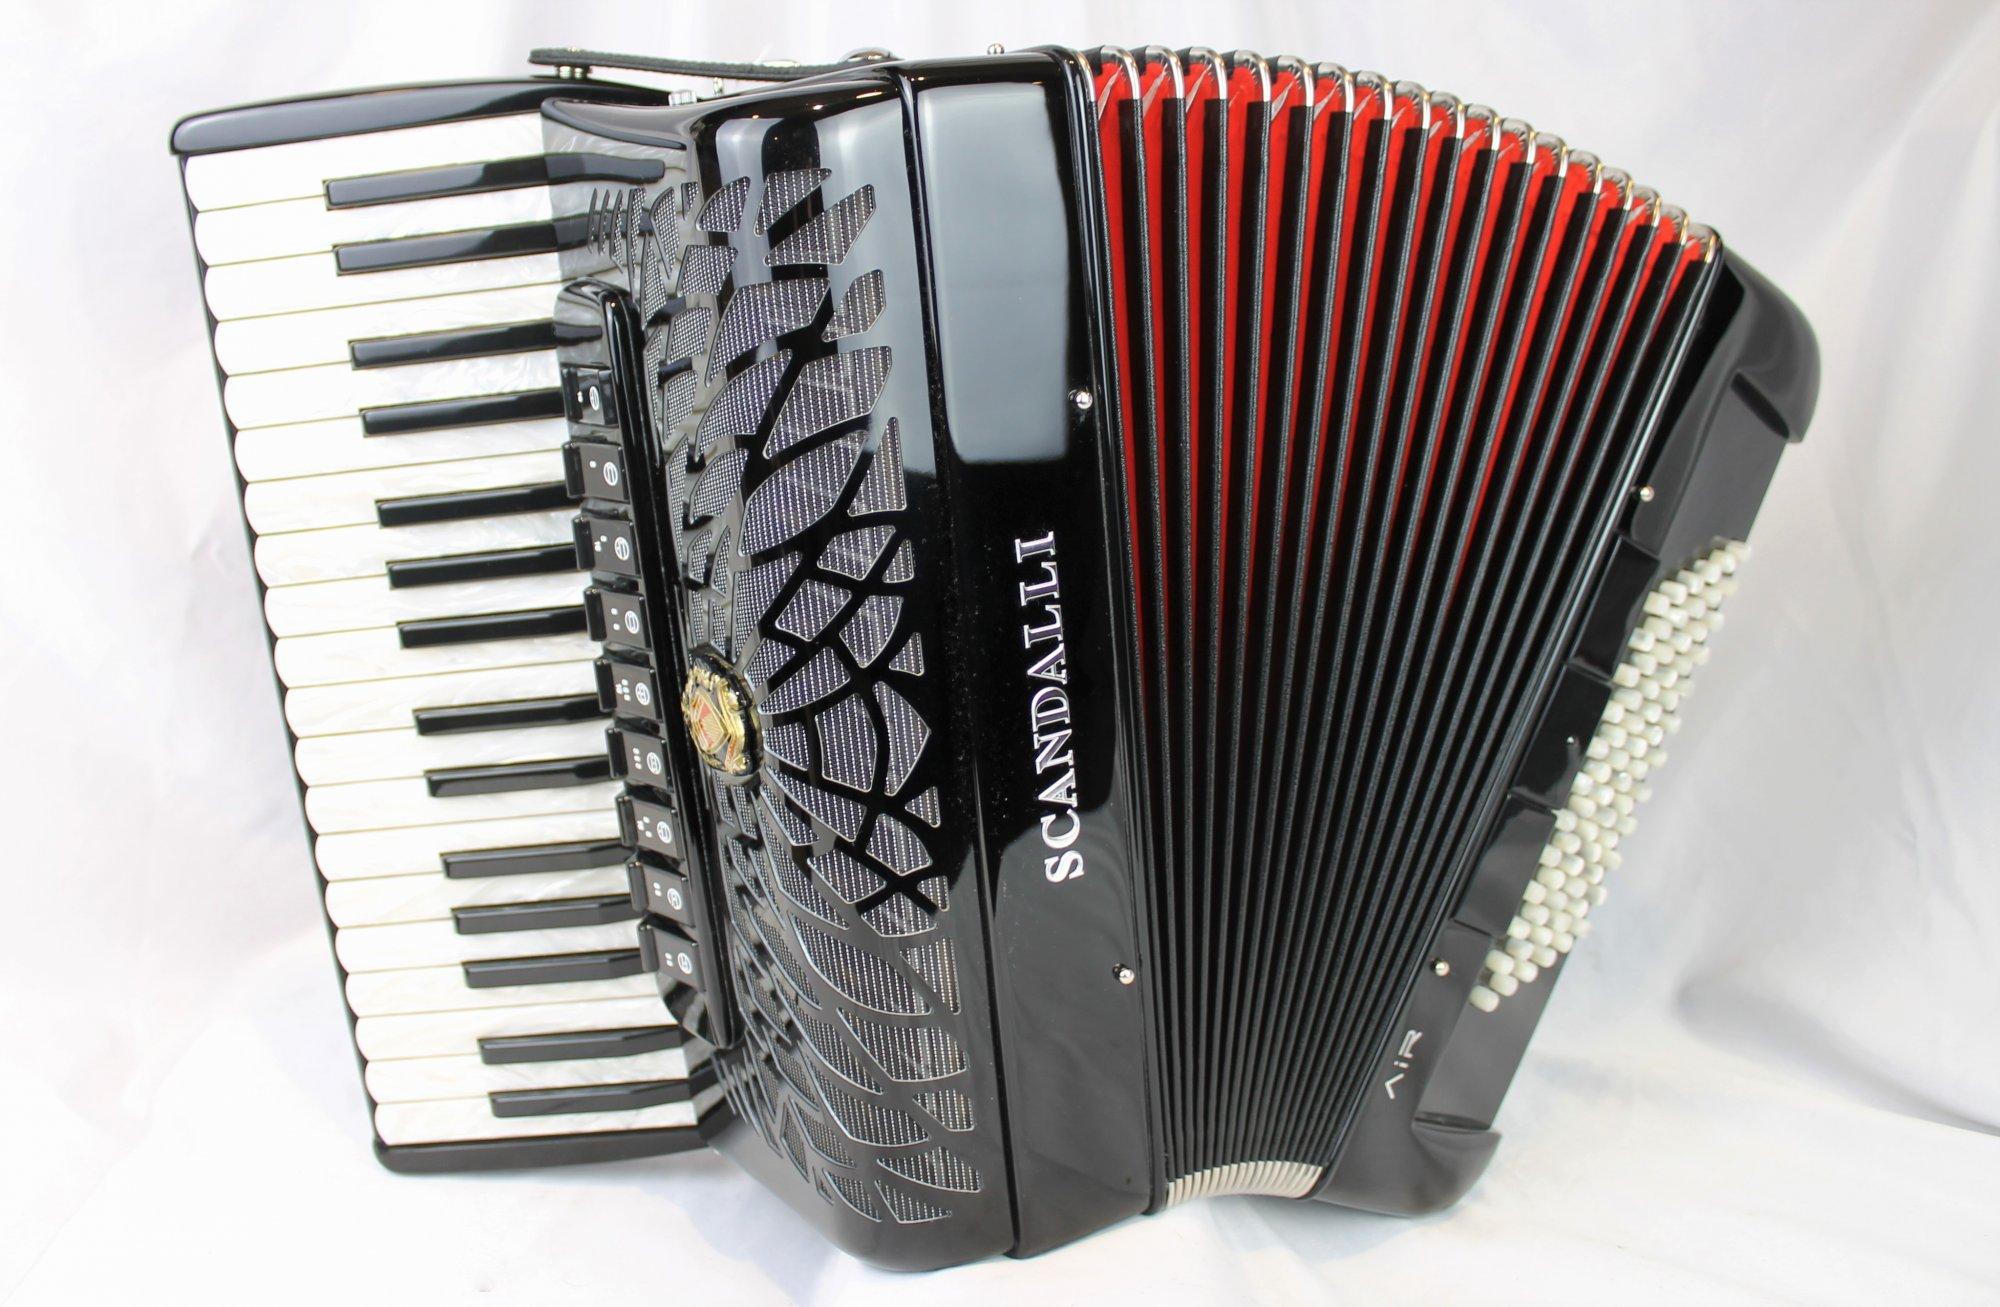 NEW Black Scandalli Air Junior Piano Accordion LMMM 34 72